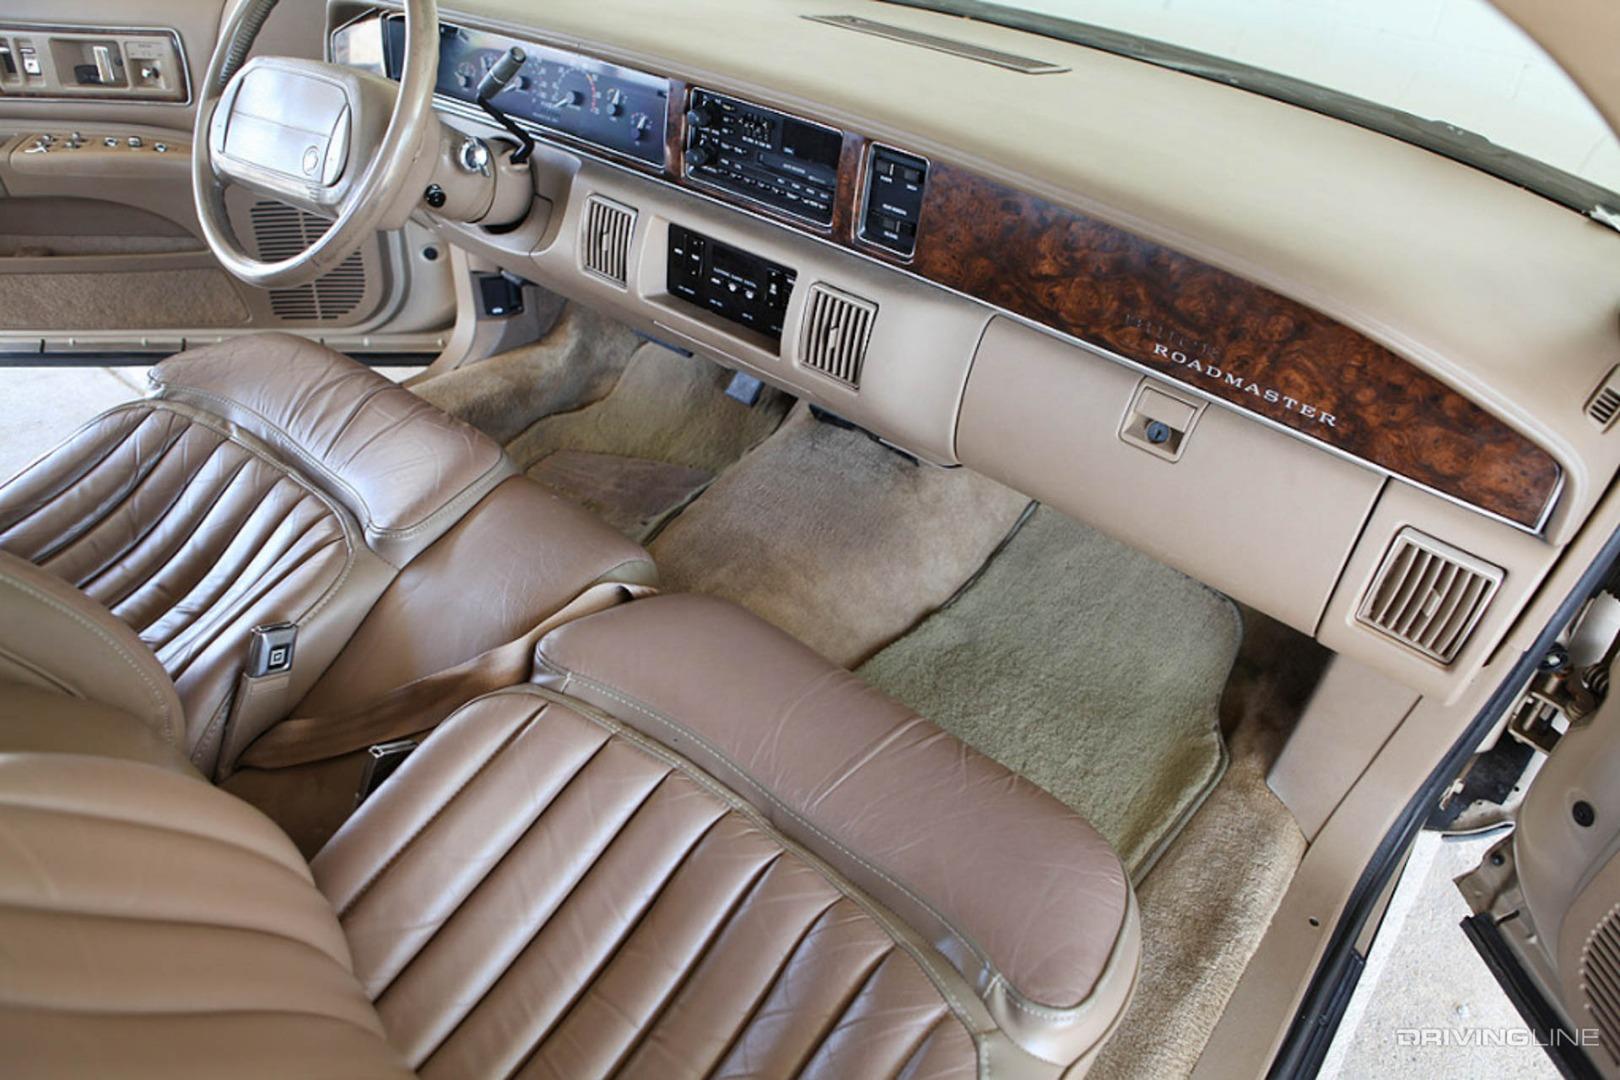 sleeper wagon the 1994 1996 buick roadmaster estate drivingline the 1994 1996 buick roadmaster estate